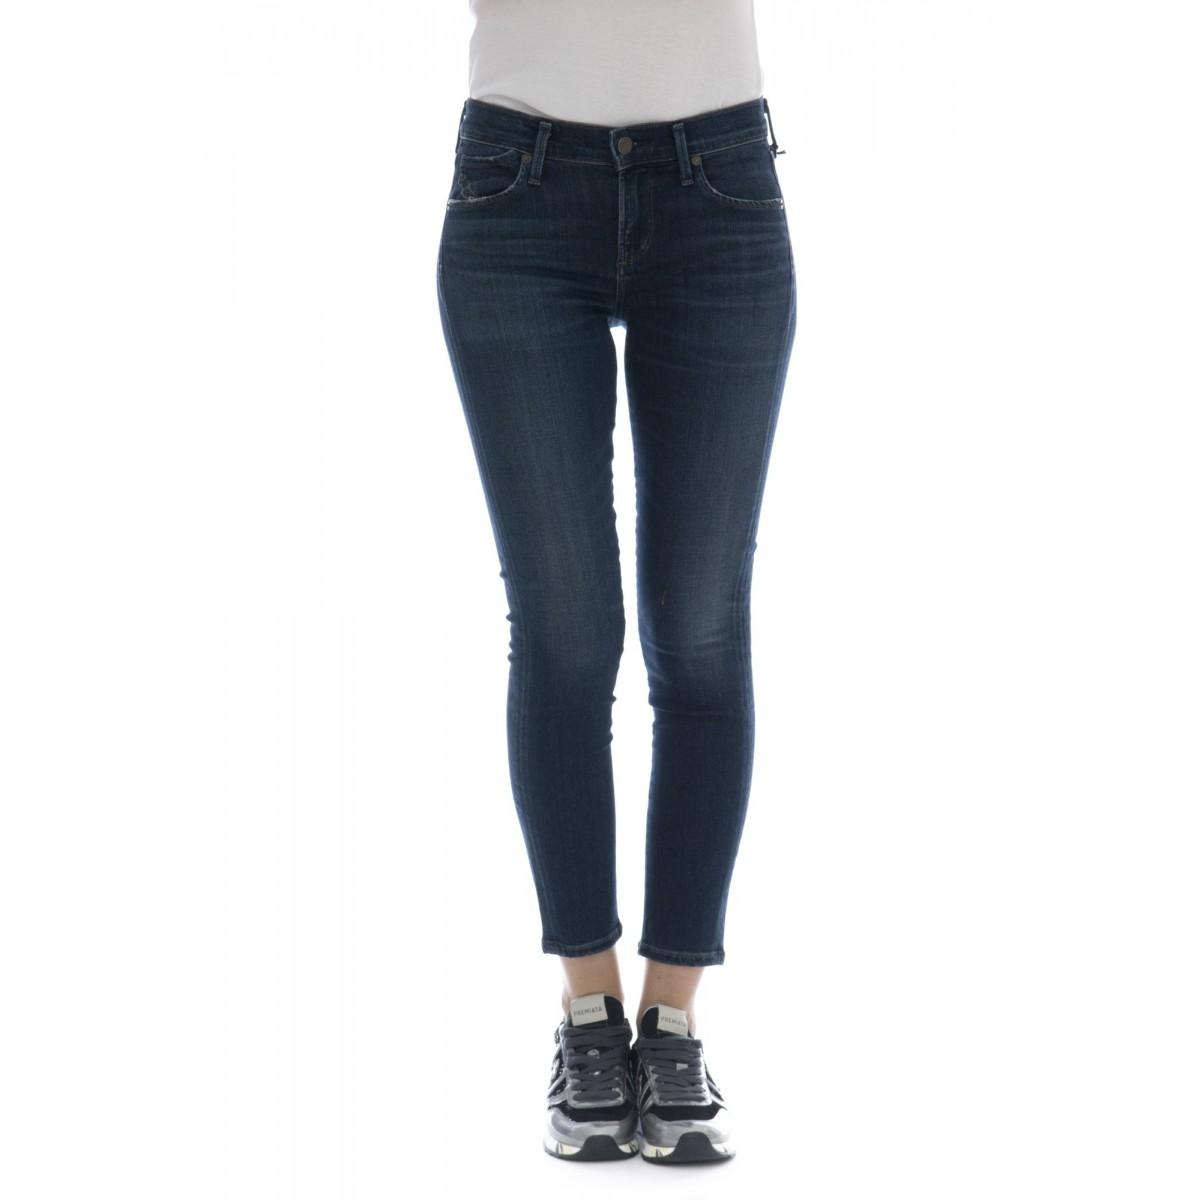 Jeans - Avedon ventana skinny